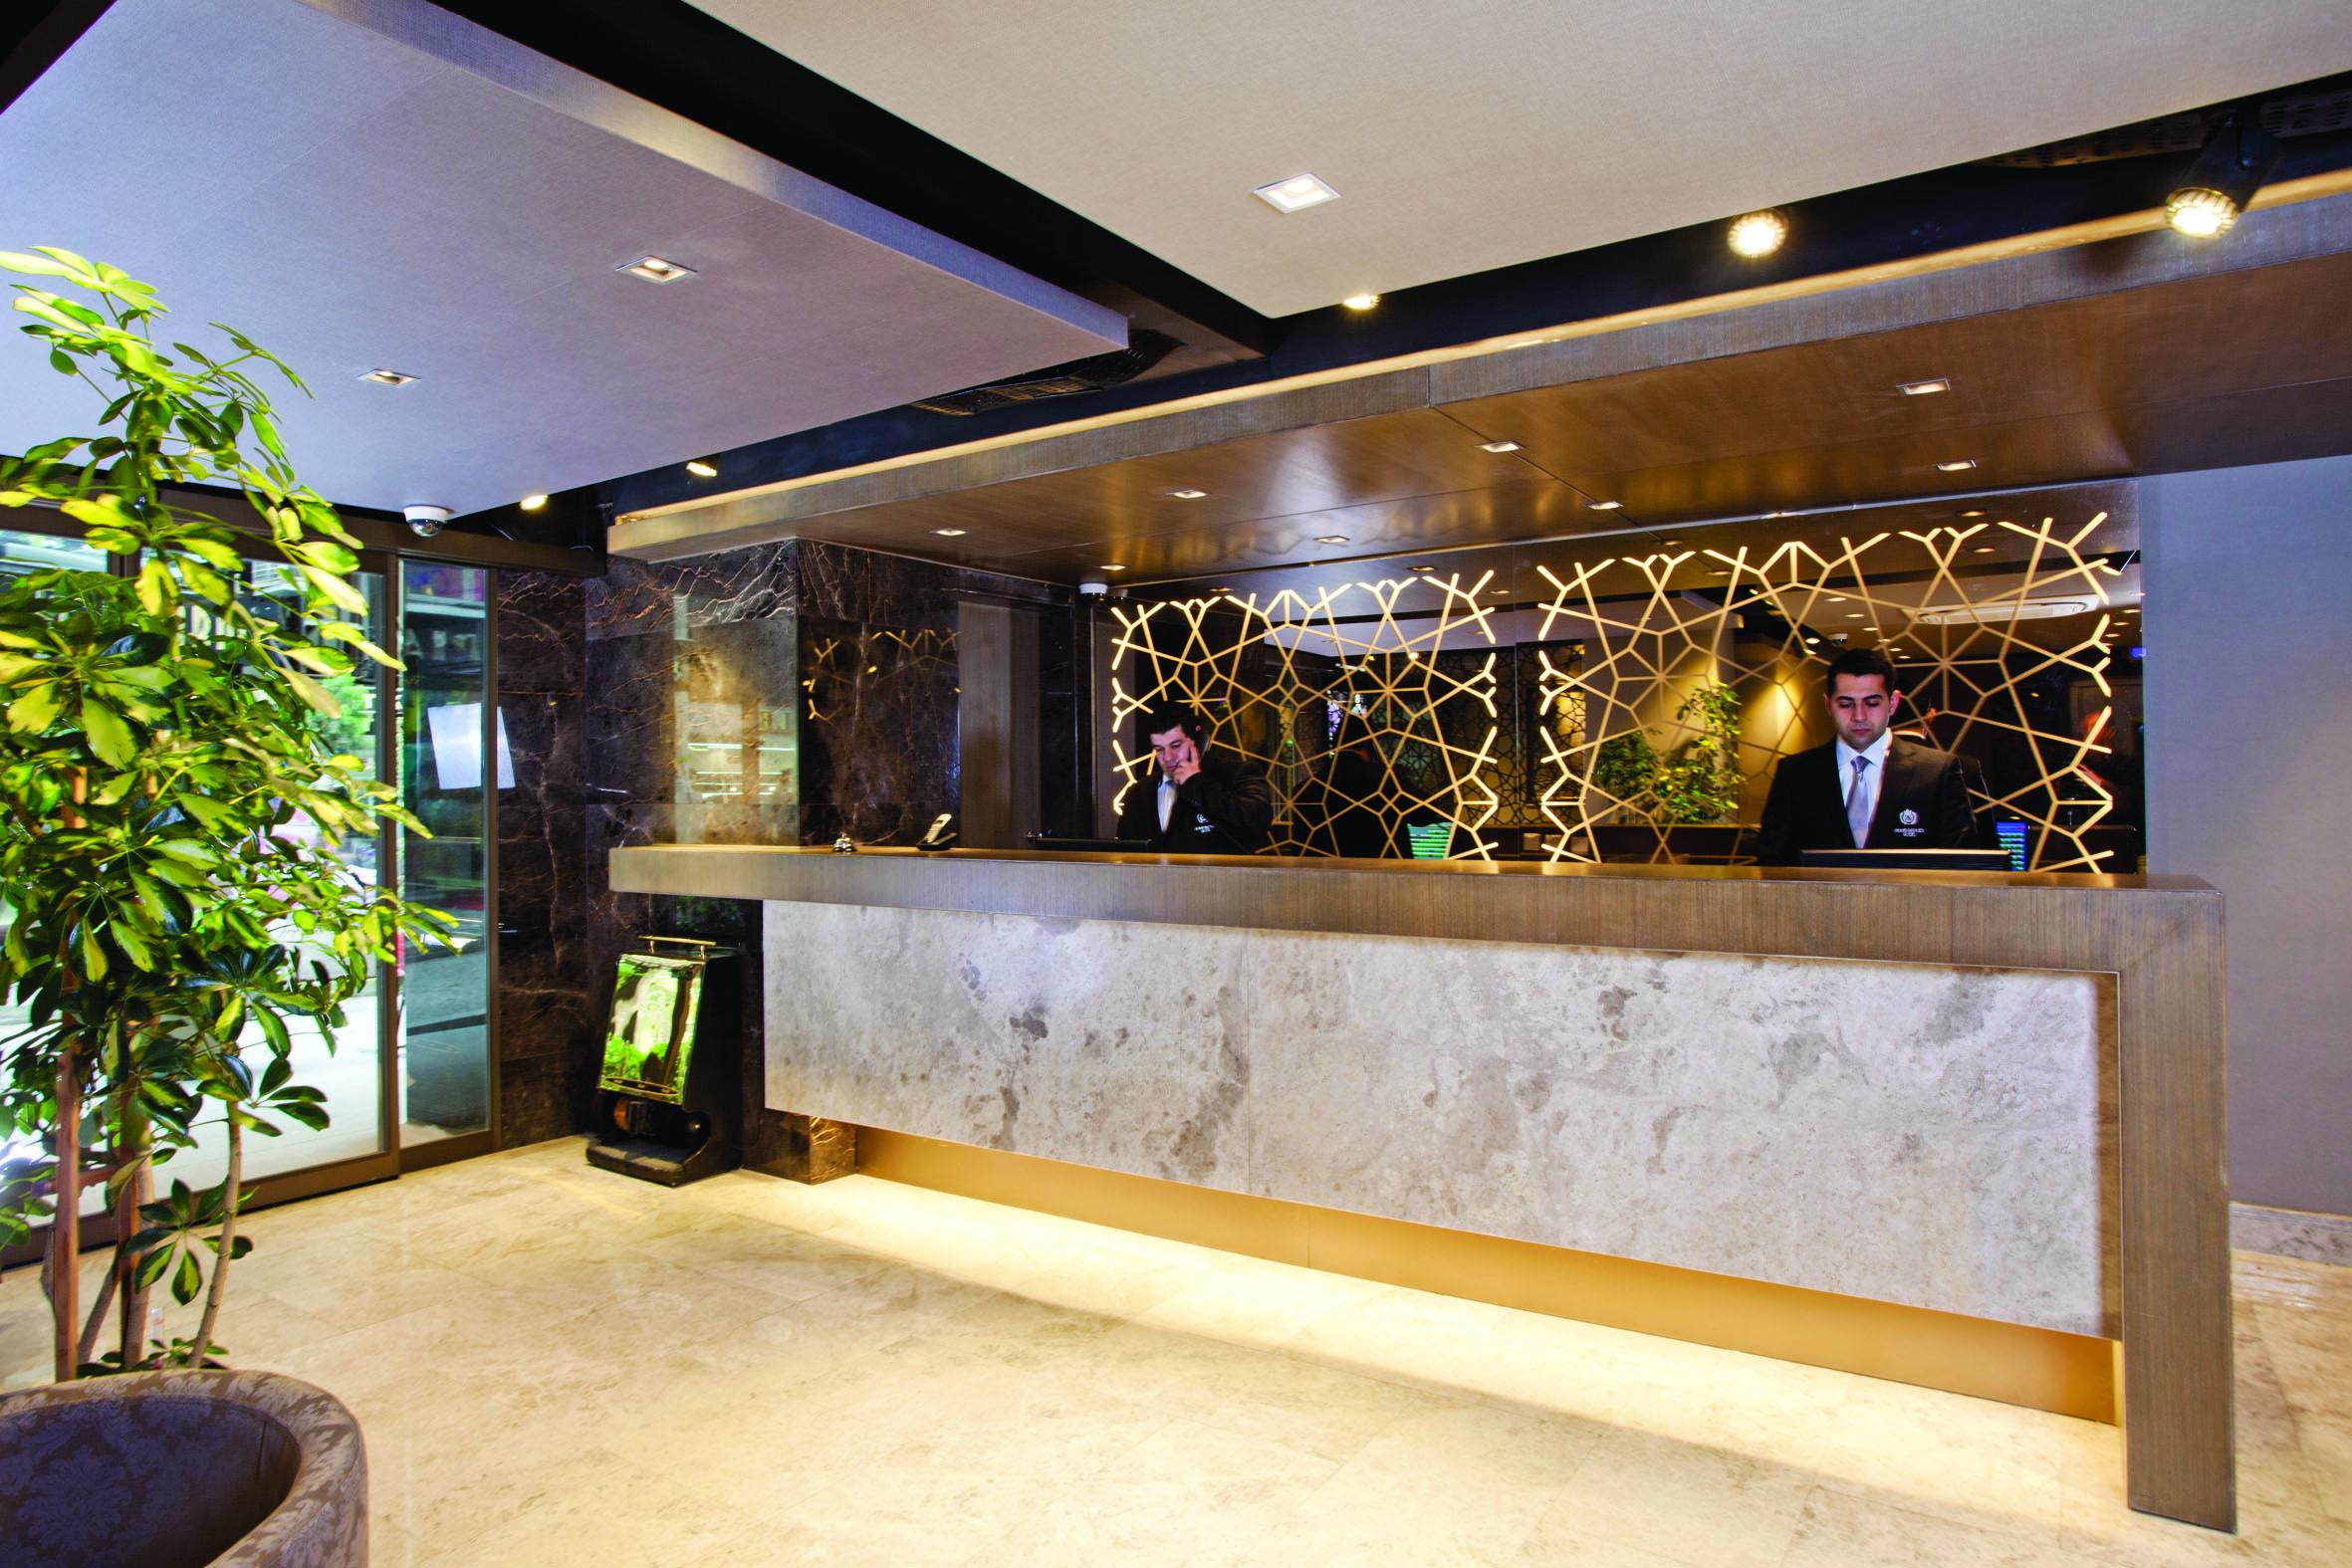 Grand beyazit hotel clubhotel for Beyazit han suites